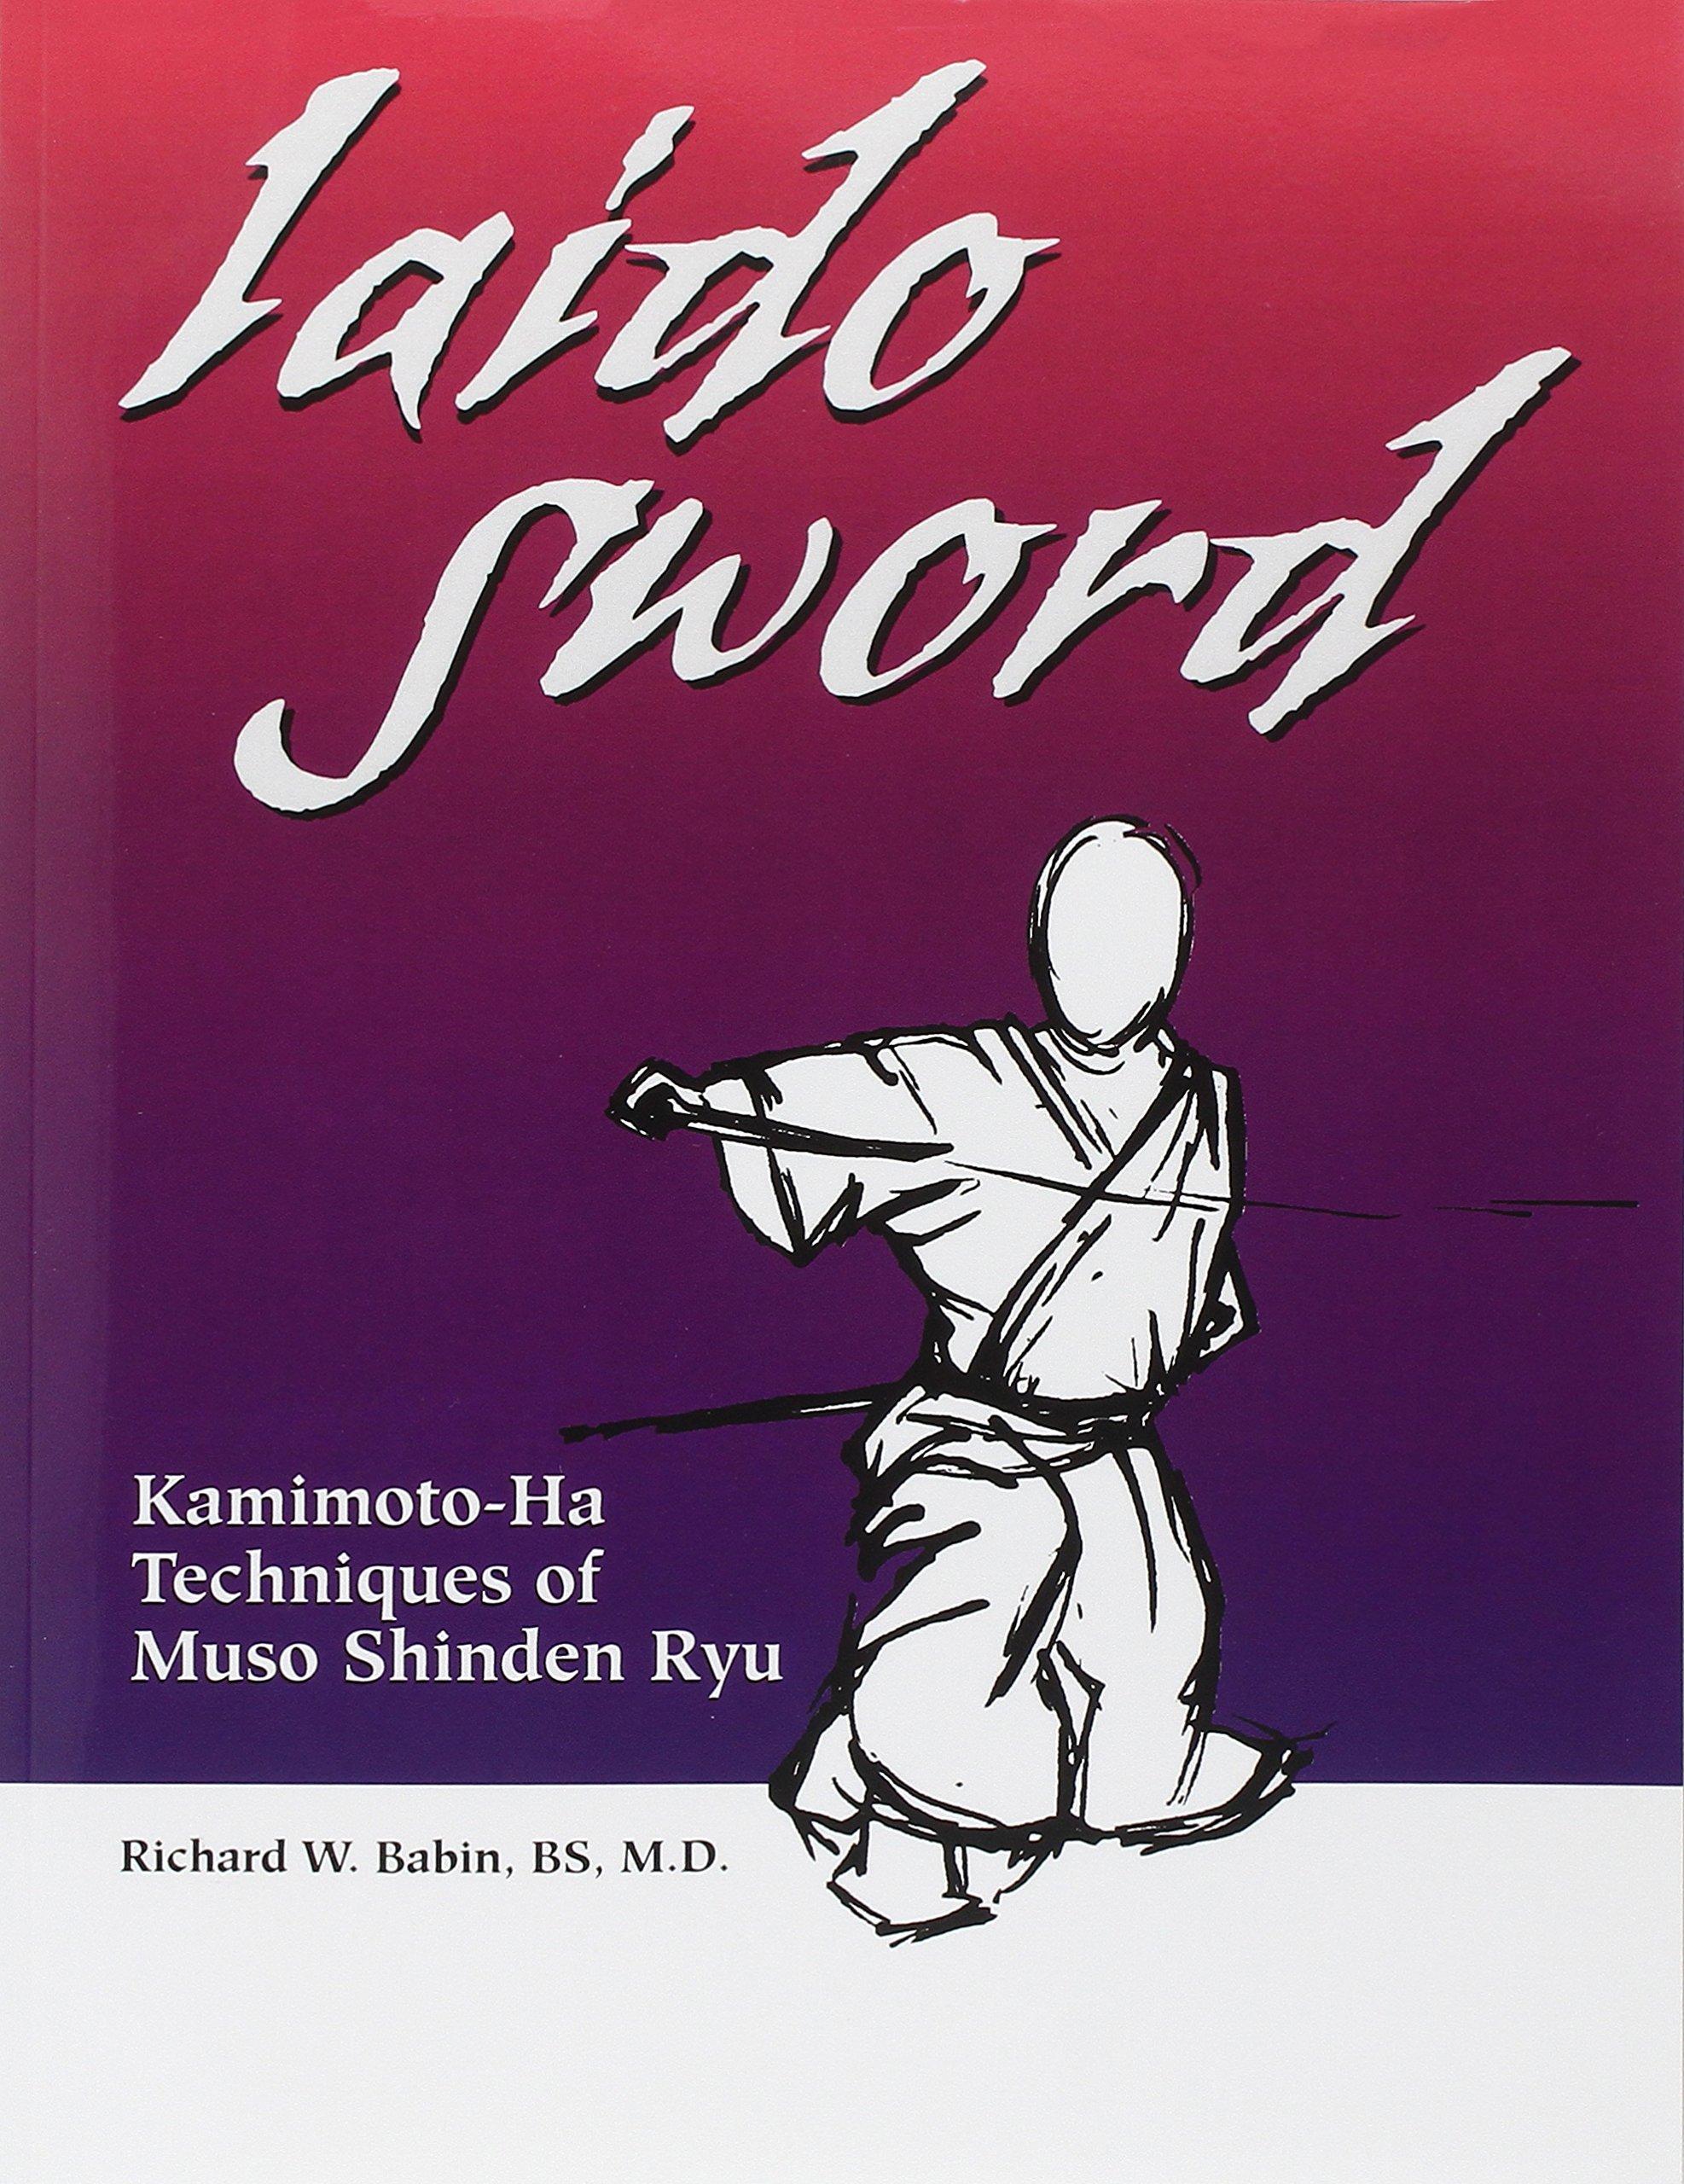 iaido-sword-kamimoto-ha-techniques-of-muso-shinden-ryu